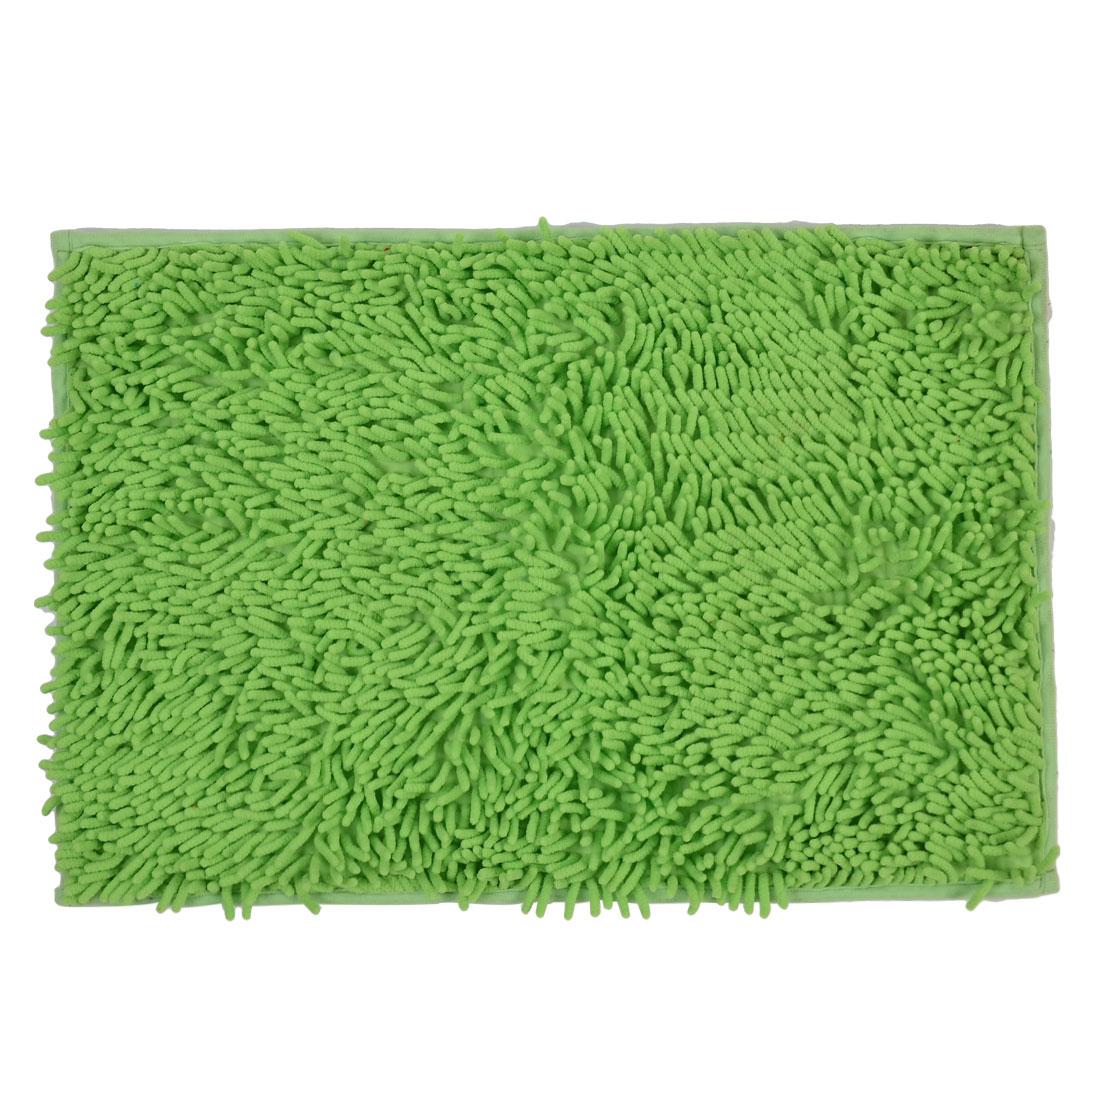 60cm x 40cm Light Green Polyester Absorbent Non-slip Pad Bath Mat Shower Rug